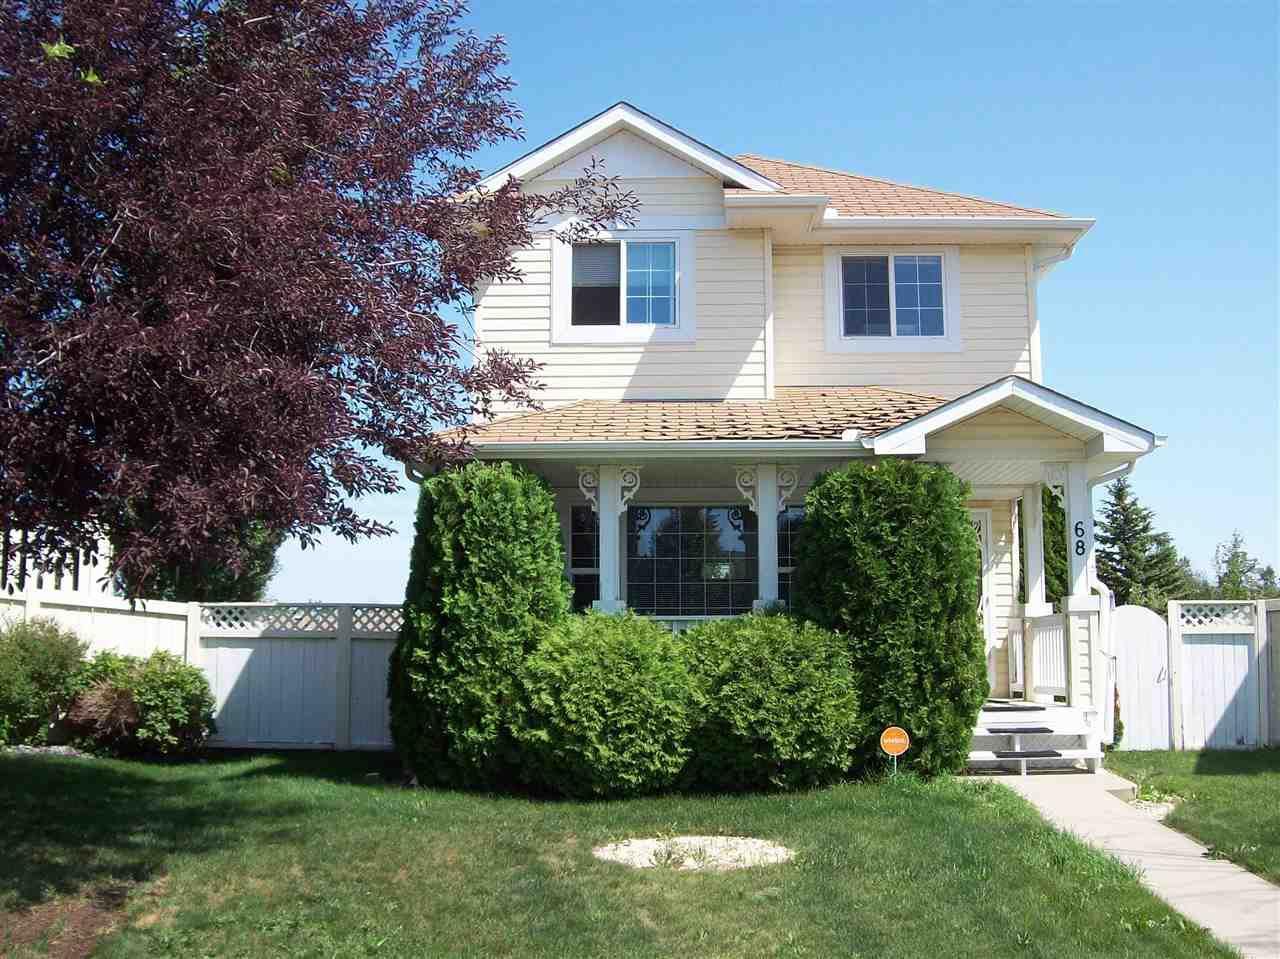 Main Photo: 68 Heatherglen Close: Spruce Grove House for sale : MLS®# E4152855